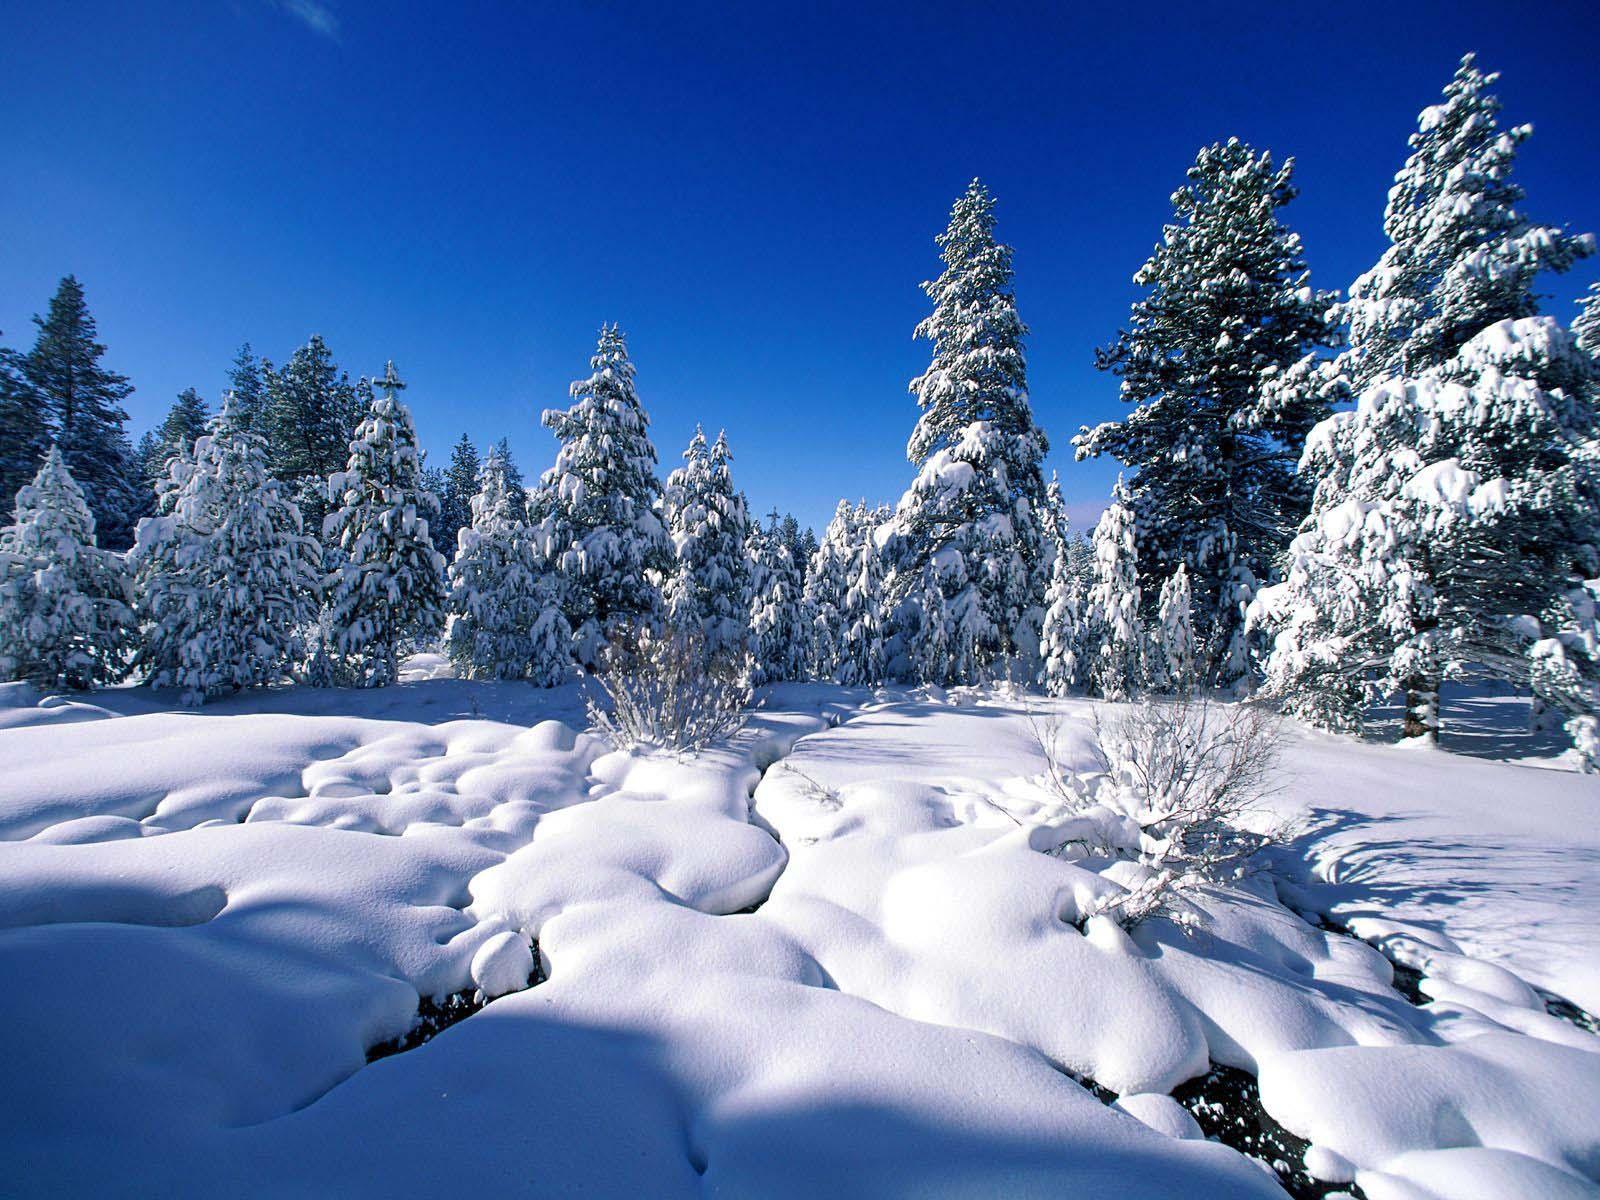 Winter wonderland 3d screensaver key generator